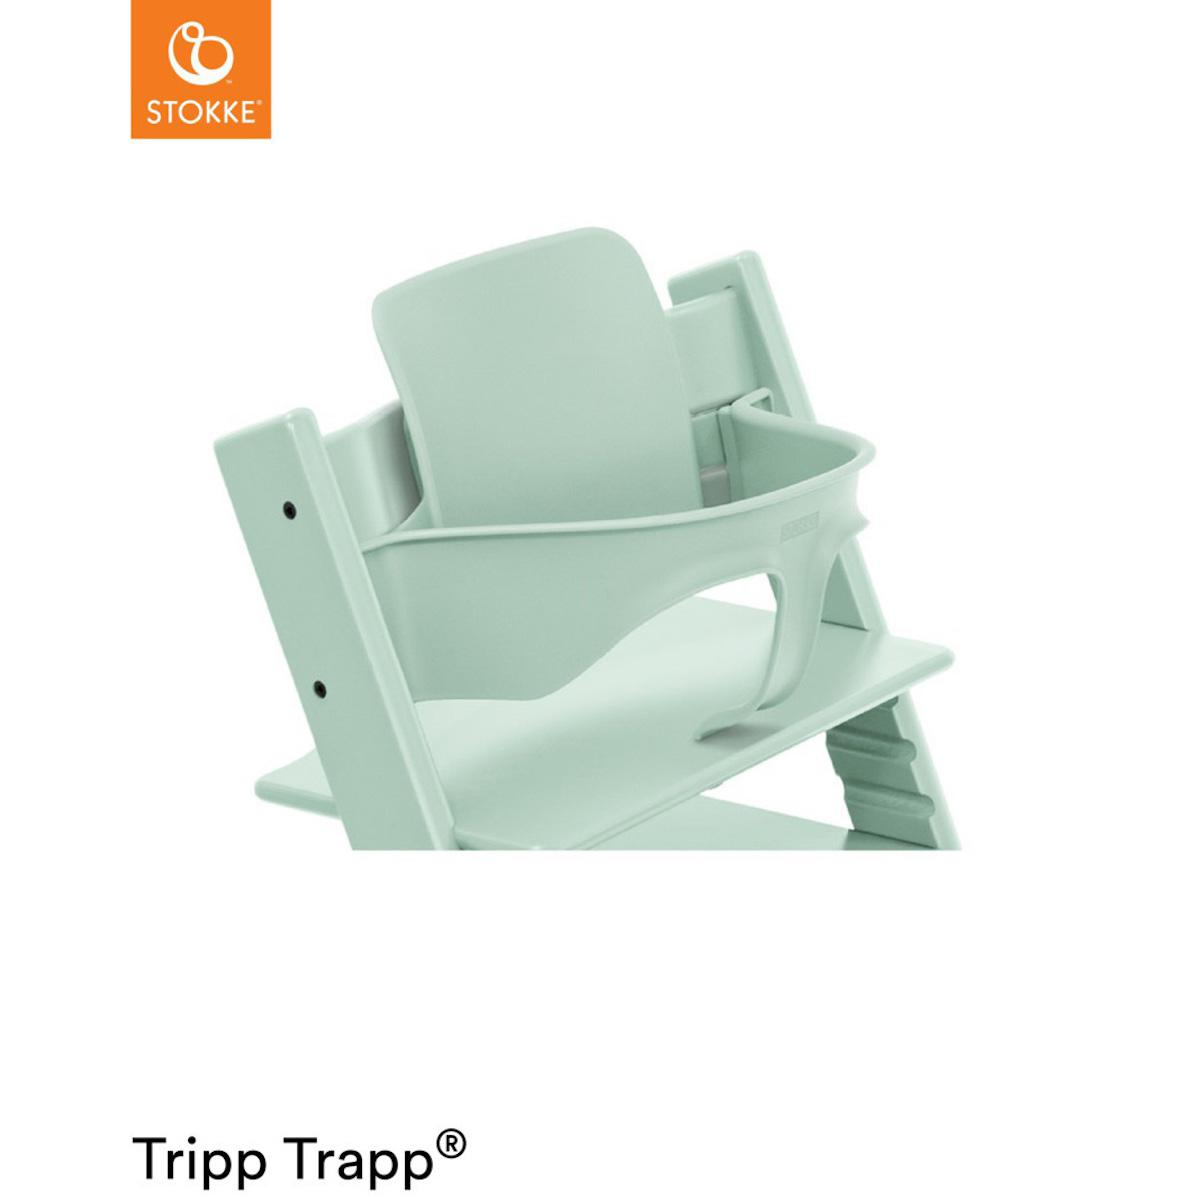 Baby set chaise haute TRIPP TRAPP Stokke Soft Mint